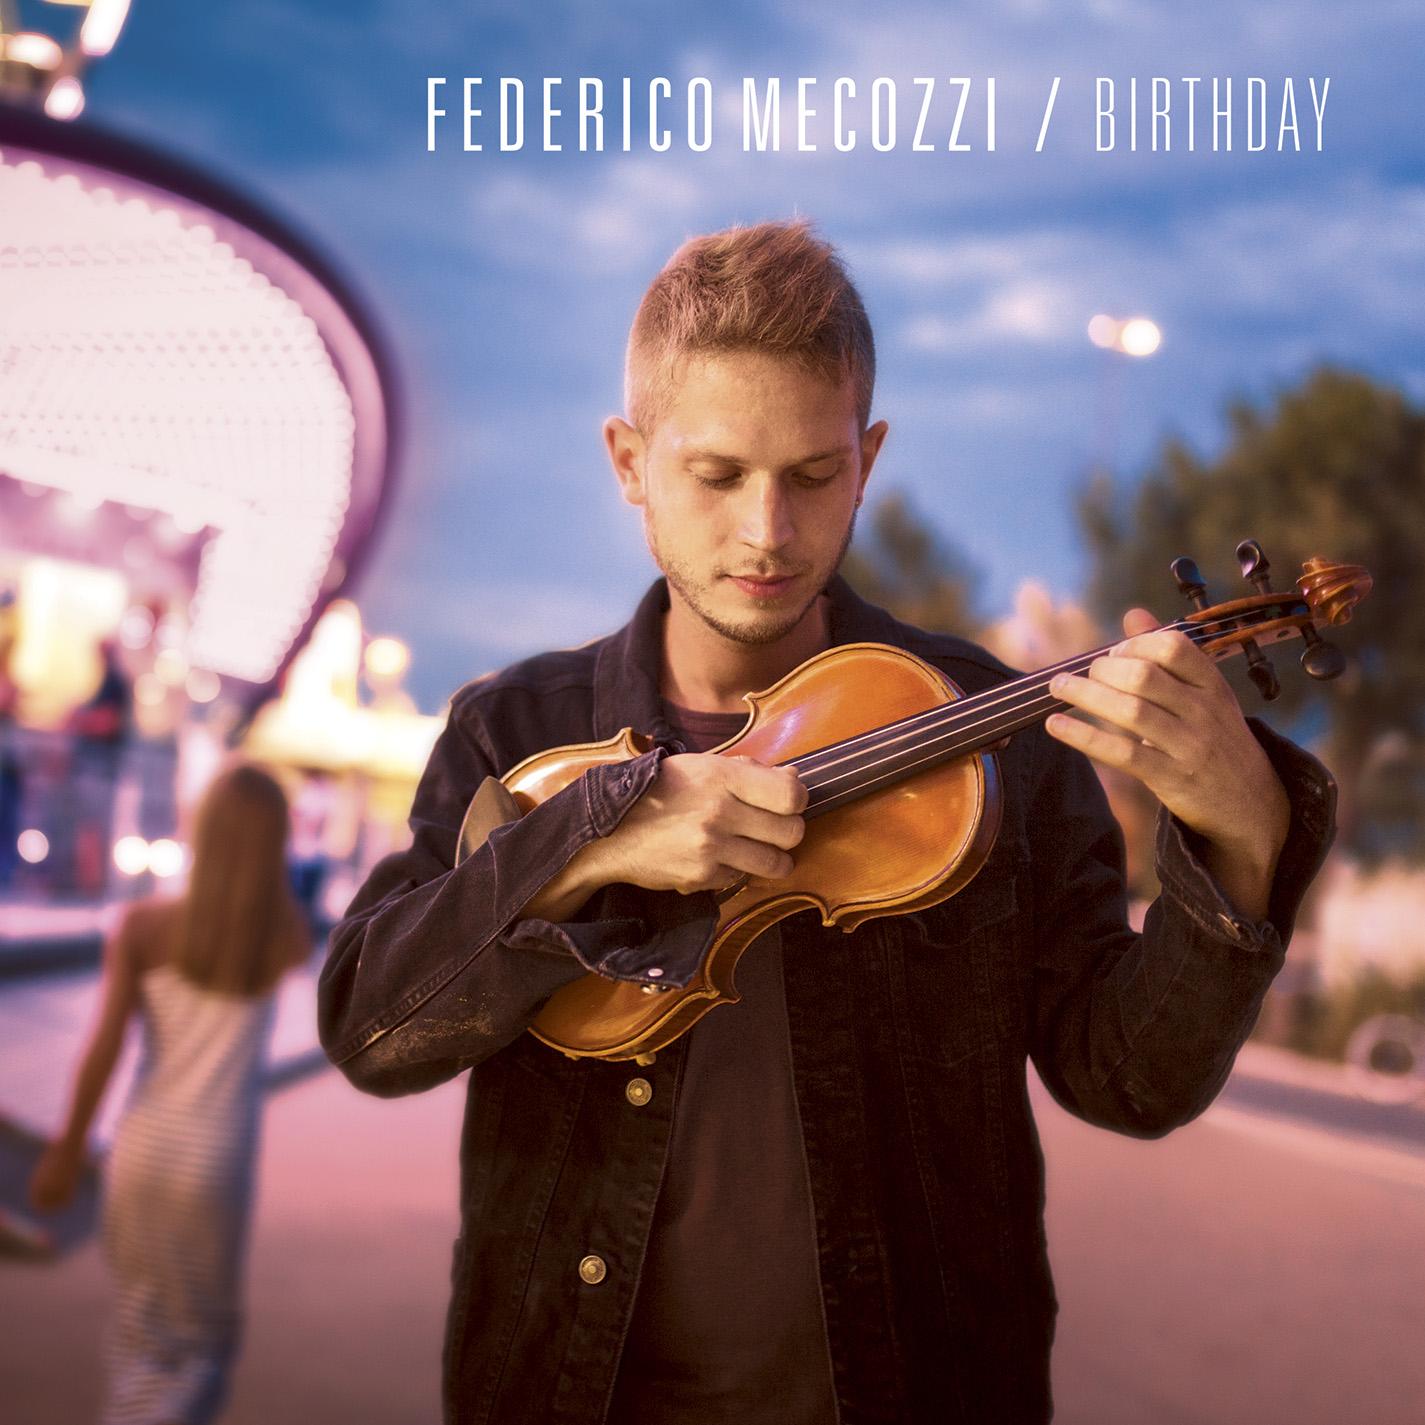 Birthday, Federico Mecozzi